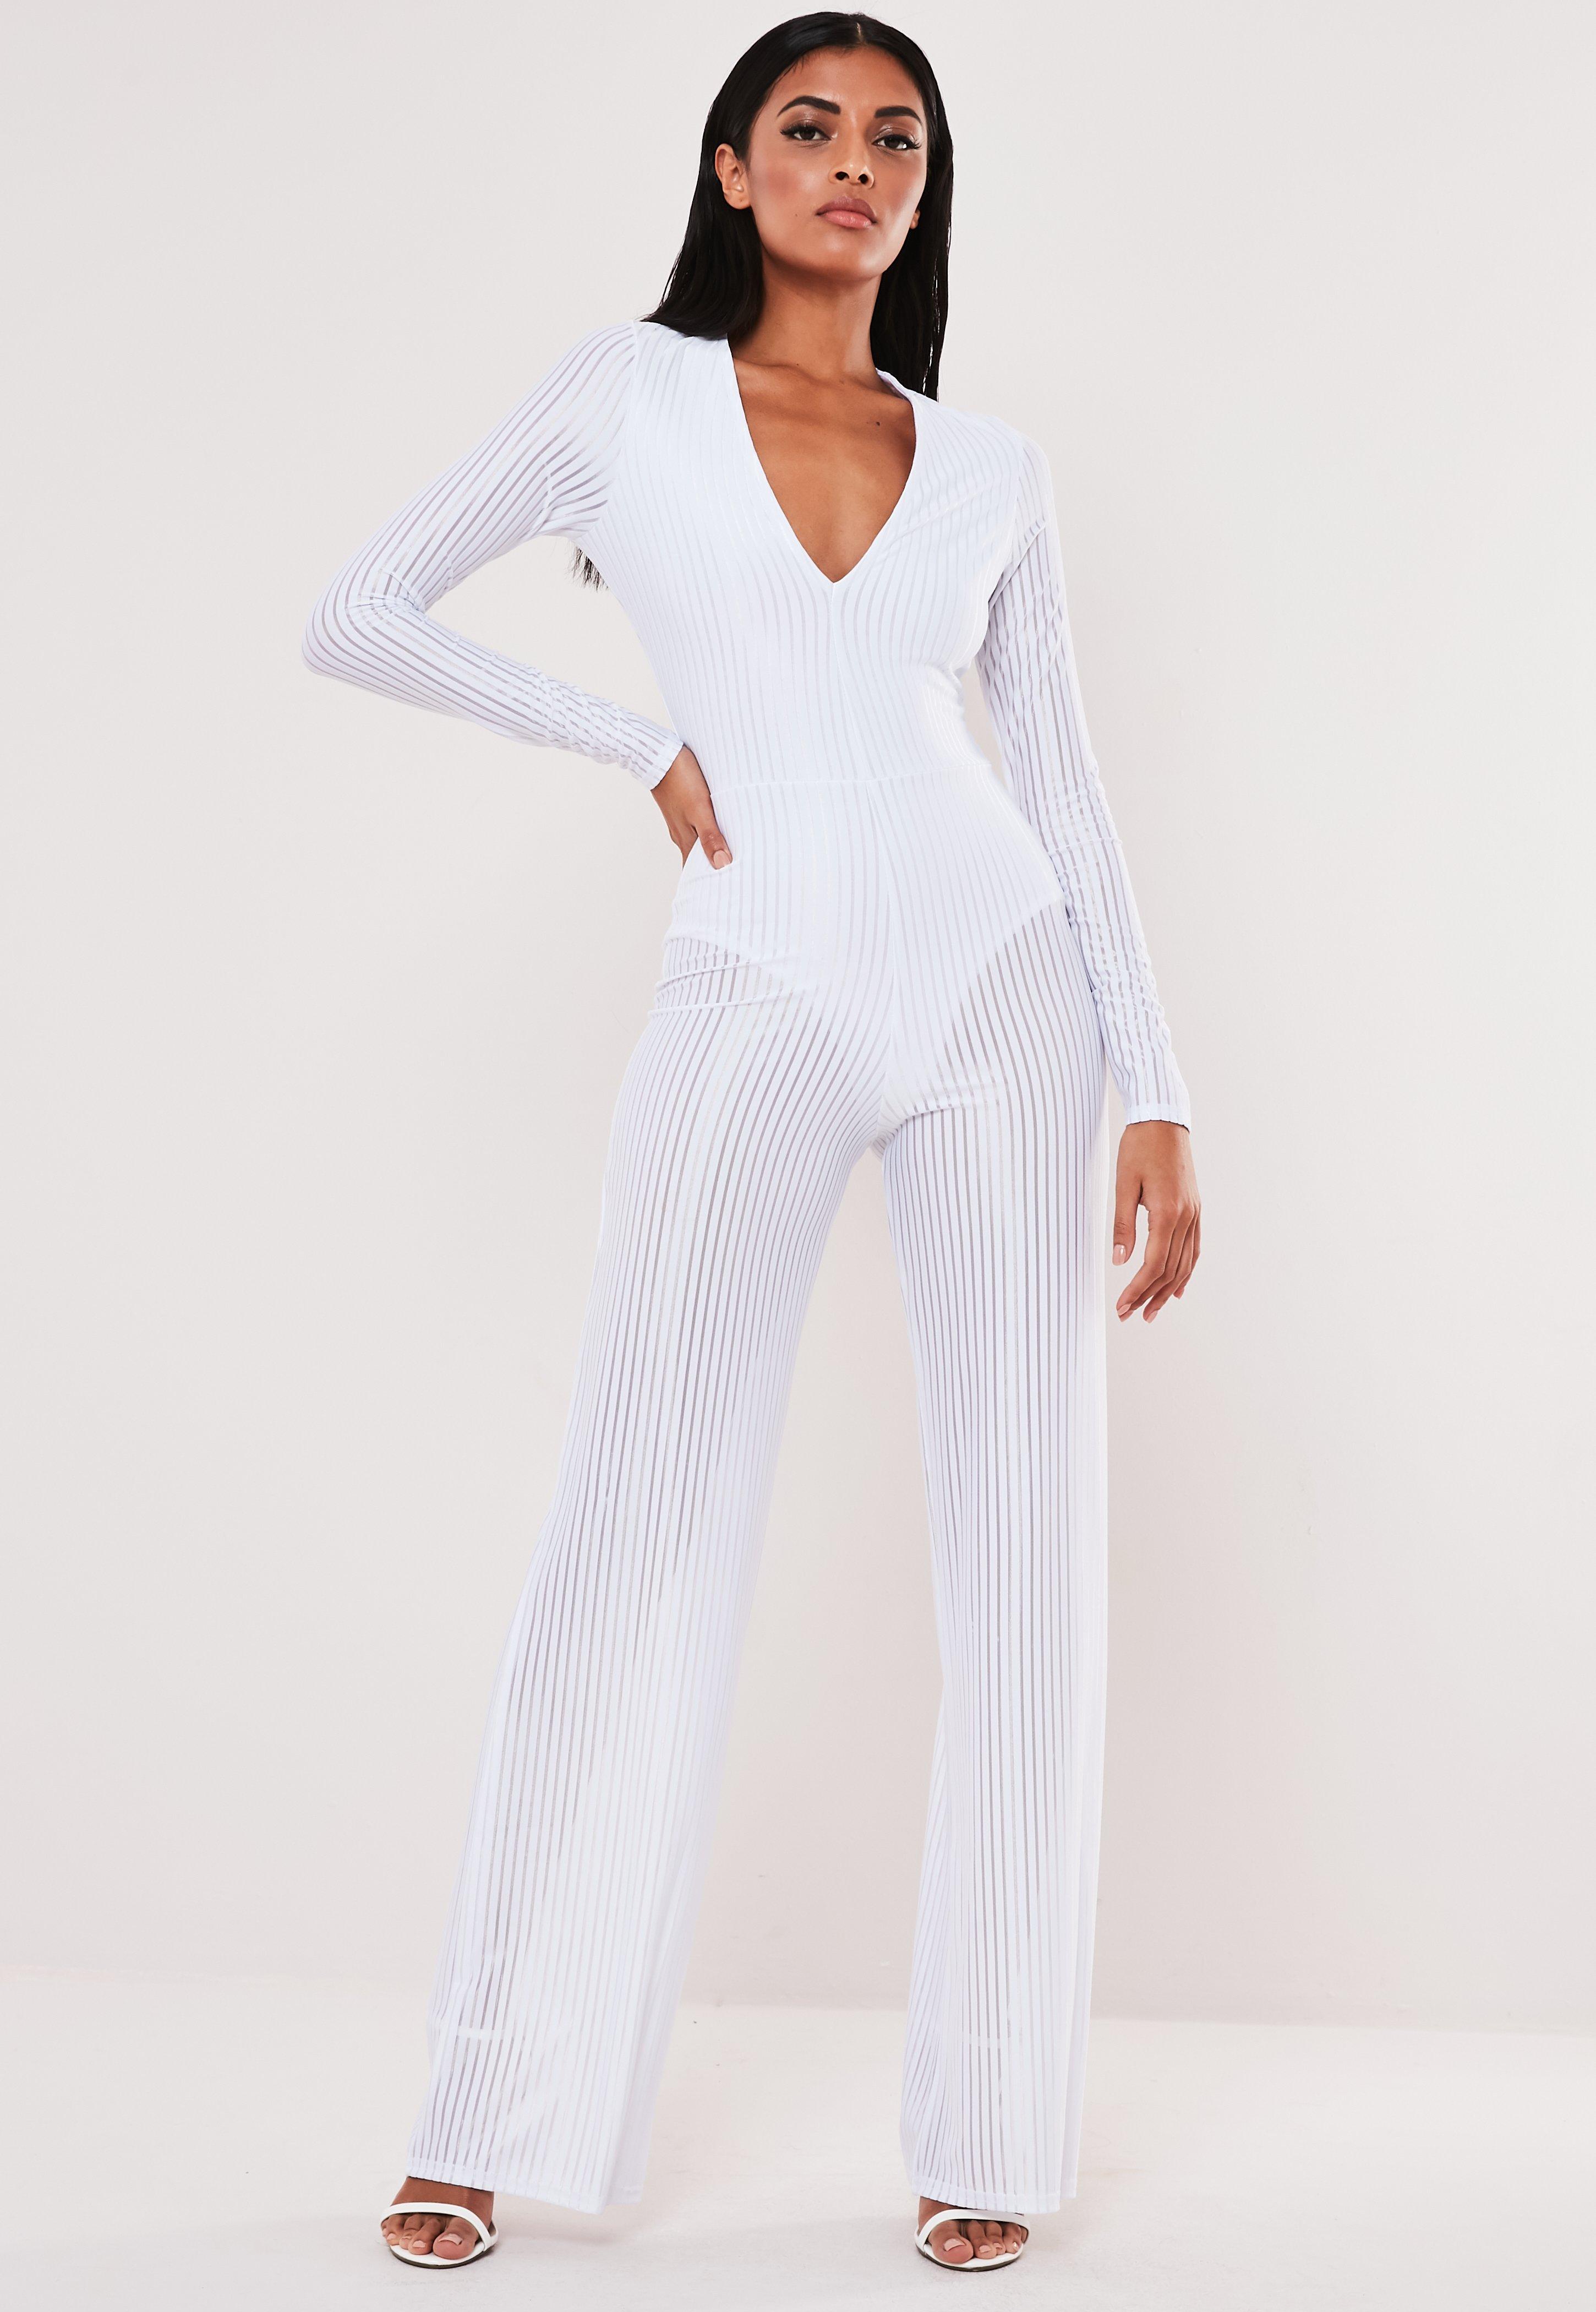 d36c34939db Dressy Jumpsuits - Evening Jumpsuits